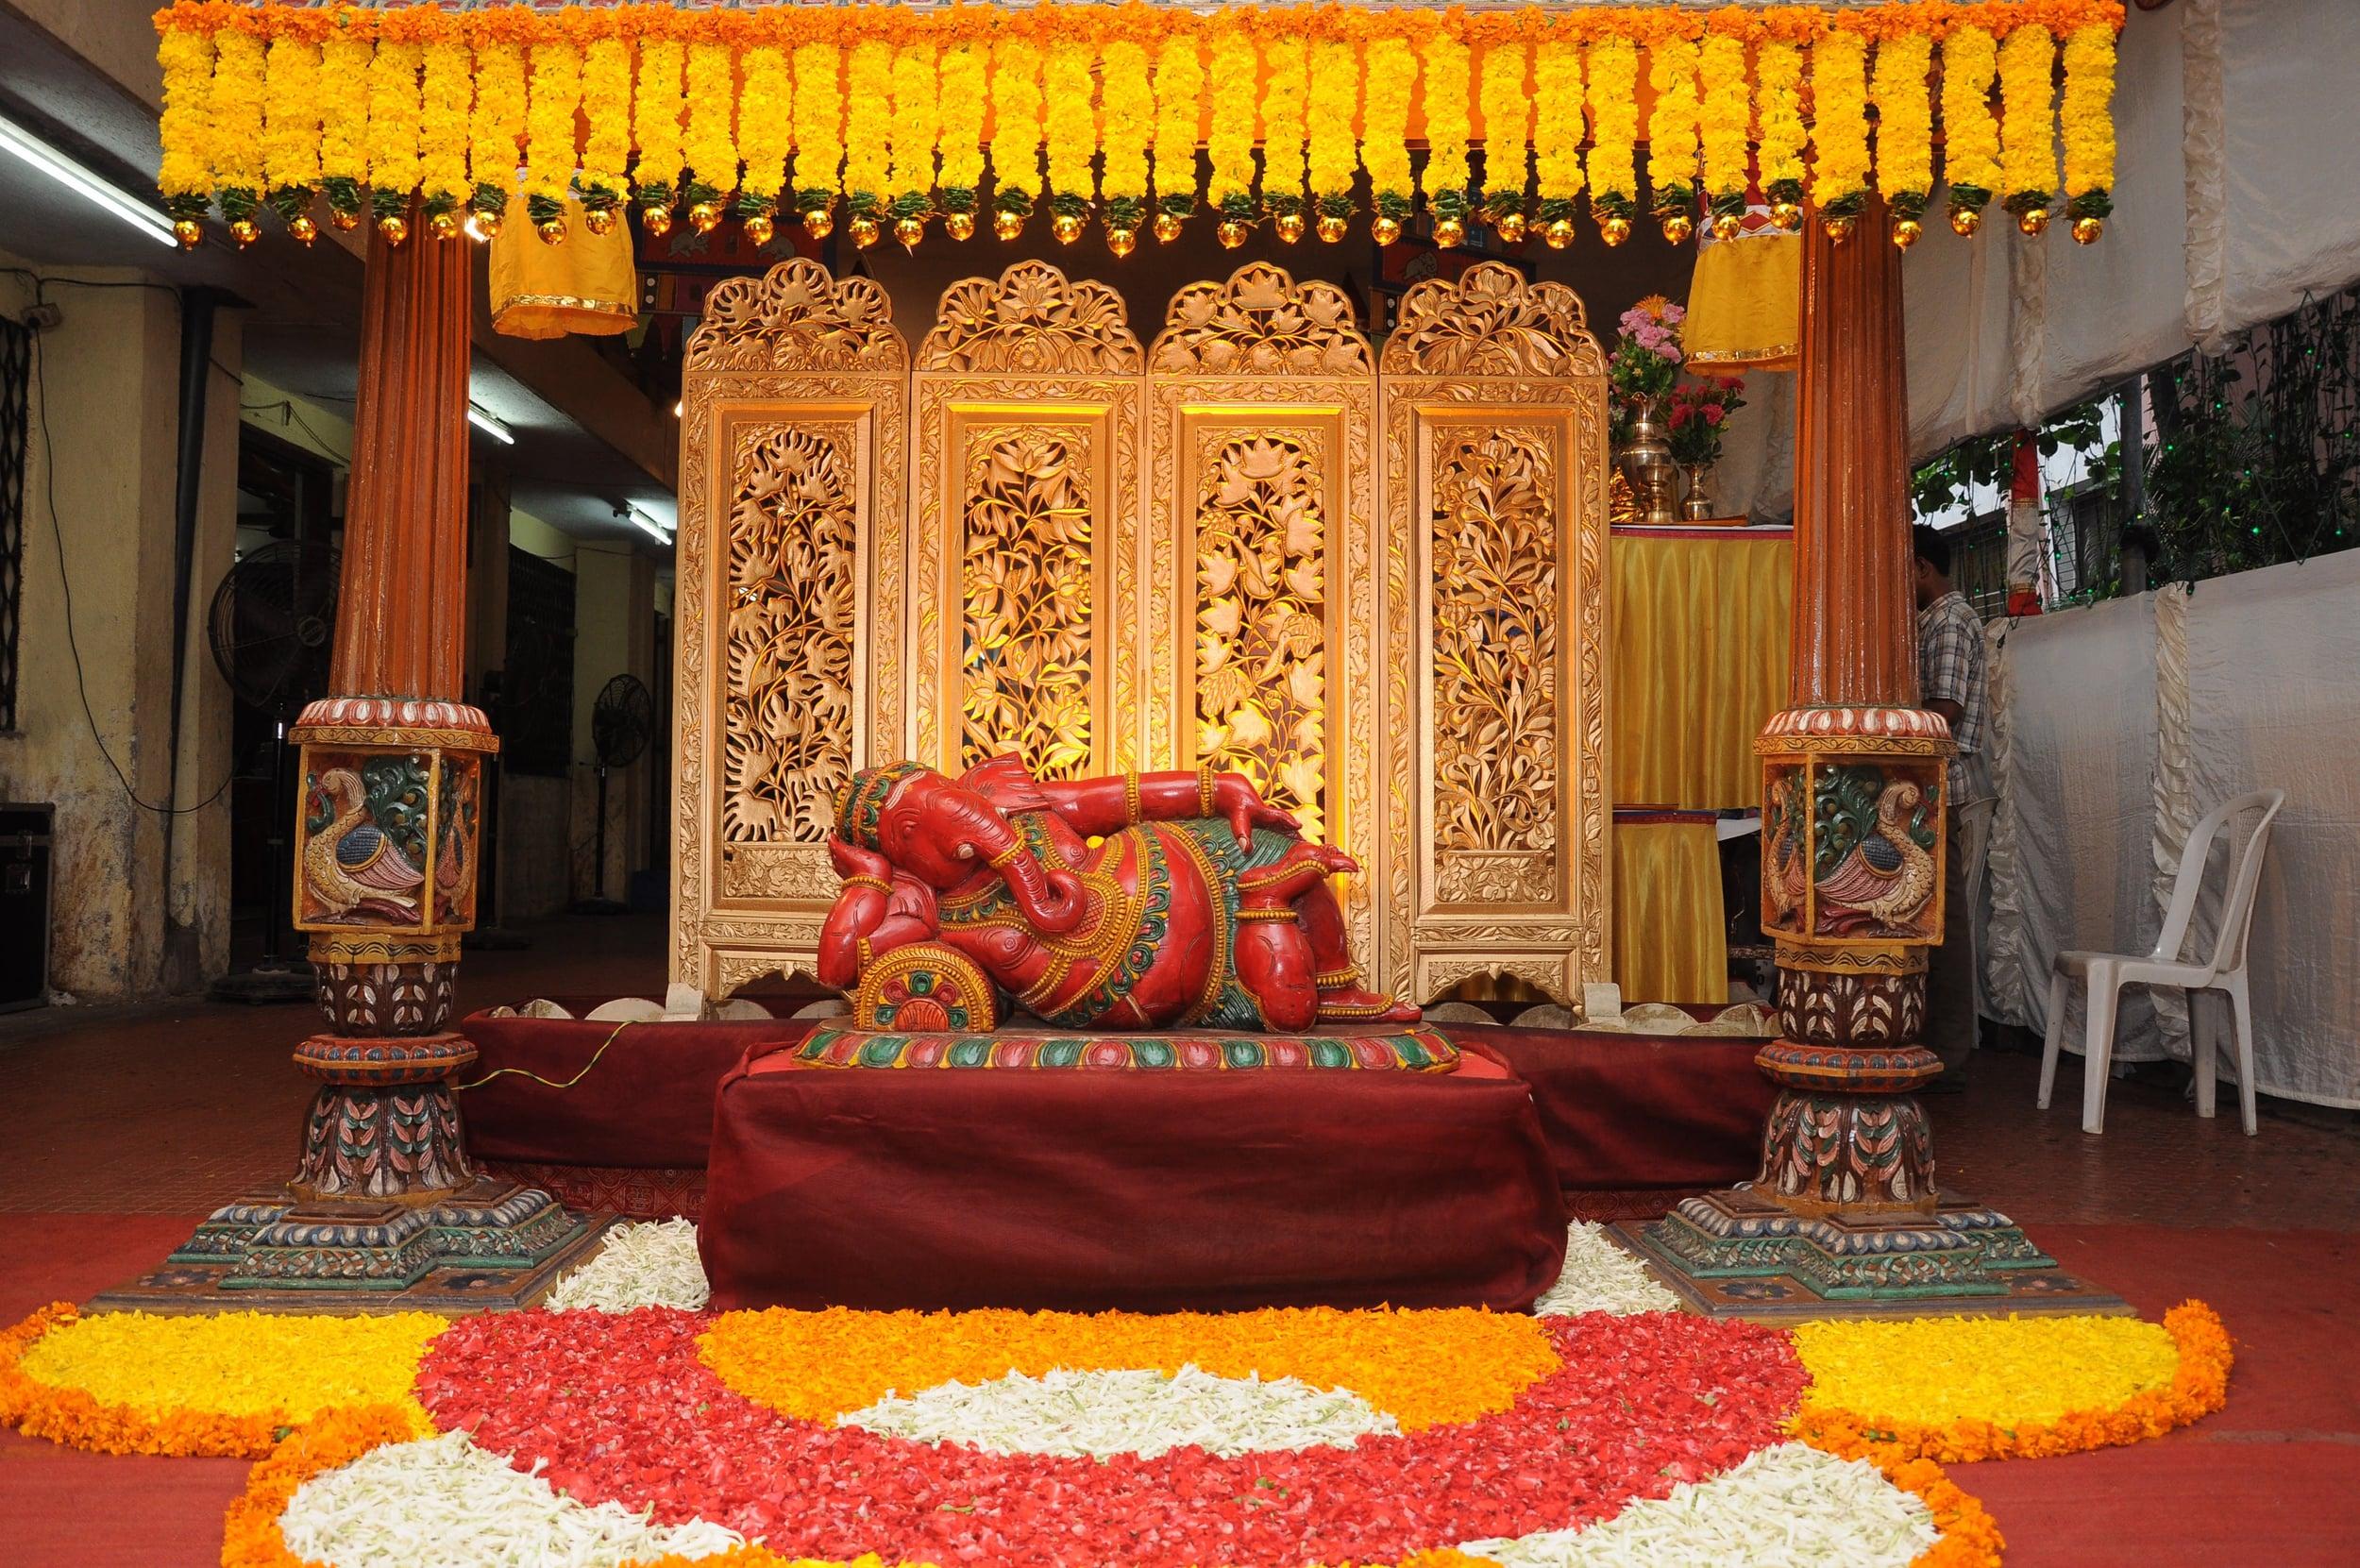 June 3 deco entry reclining Ganapati.jpg